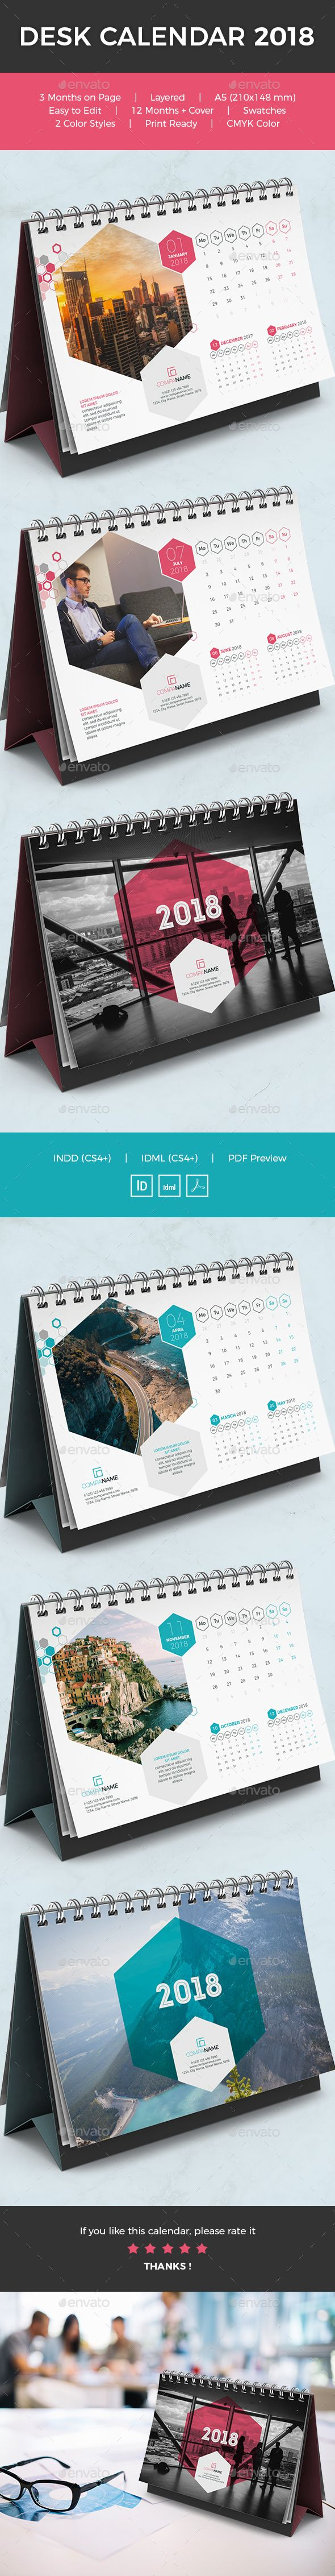 desk calendar 2018 calendar 2018 desk calendars and desks